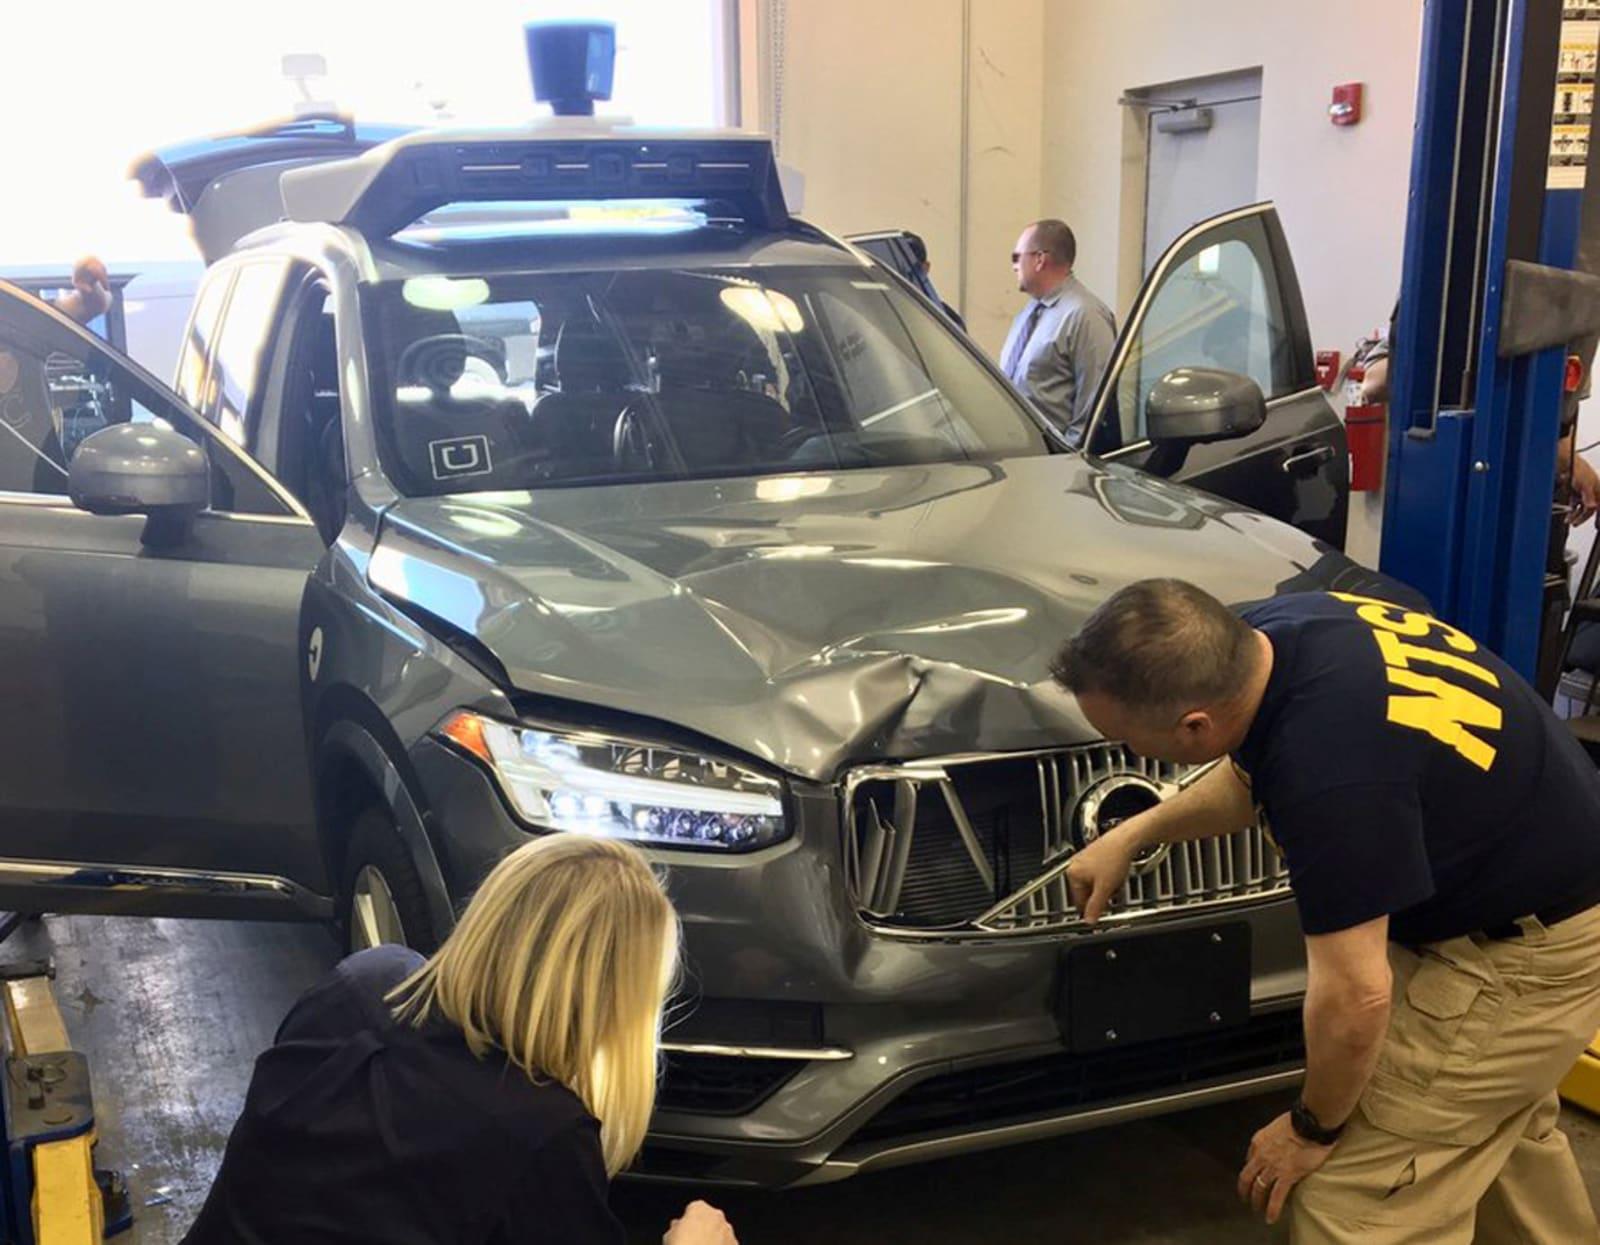 Arizona governor suspends Uber's self-driving car tests